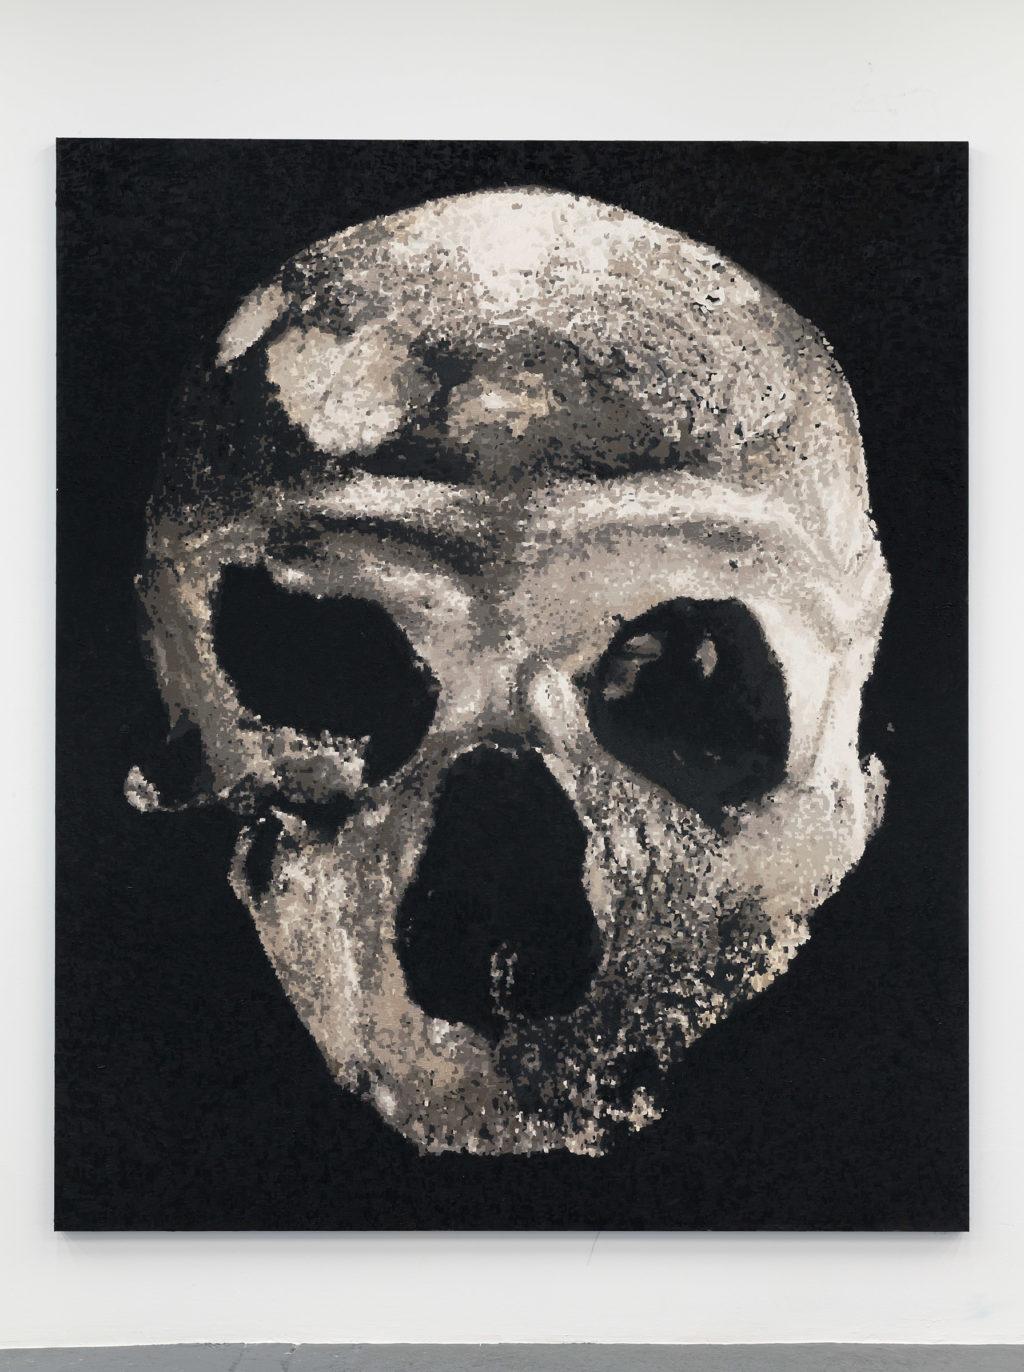 Blake Rayne, Skull Anabranch, 2018